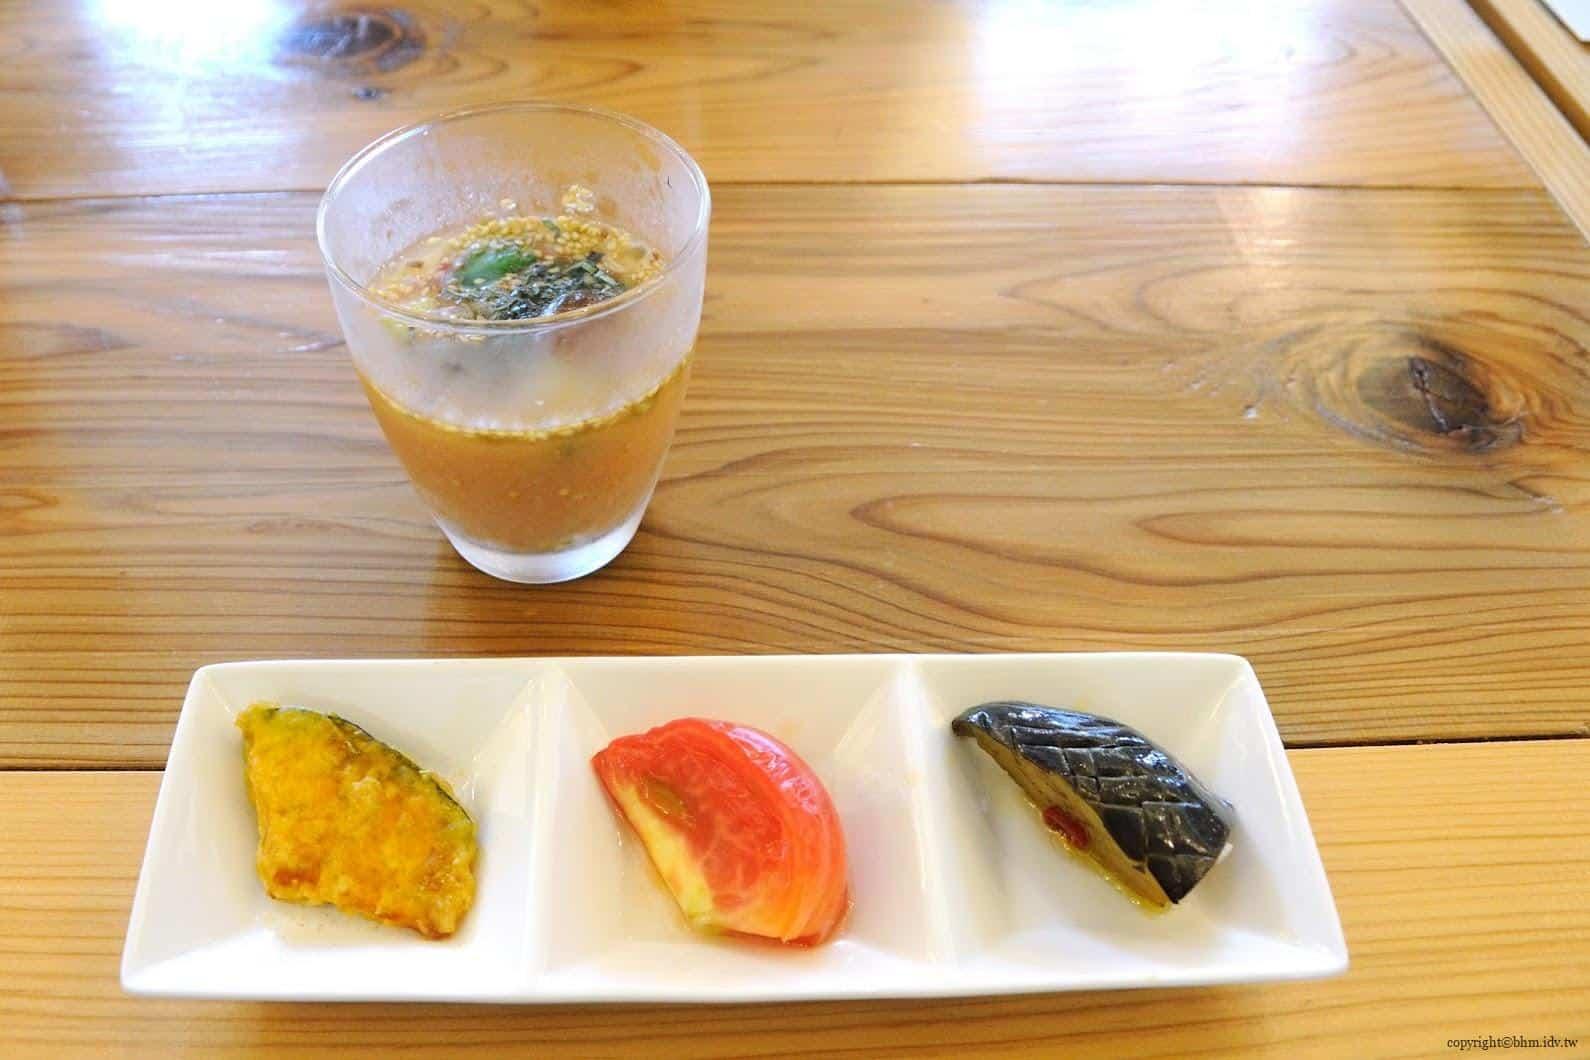 KITCHEN,米澤文雄(Jean-Georges),前菜是法式味噌冷湯,很有特色但沒有合筆者胃口,喝一口就放在旁邊。下方擺盤由左而右的南瓜、番茄與茄子,用不同方式料理口感留下深刻印象 art-field 奴奈川校園-TSUMARI KITCHEN tsumari kitchen 04